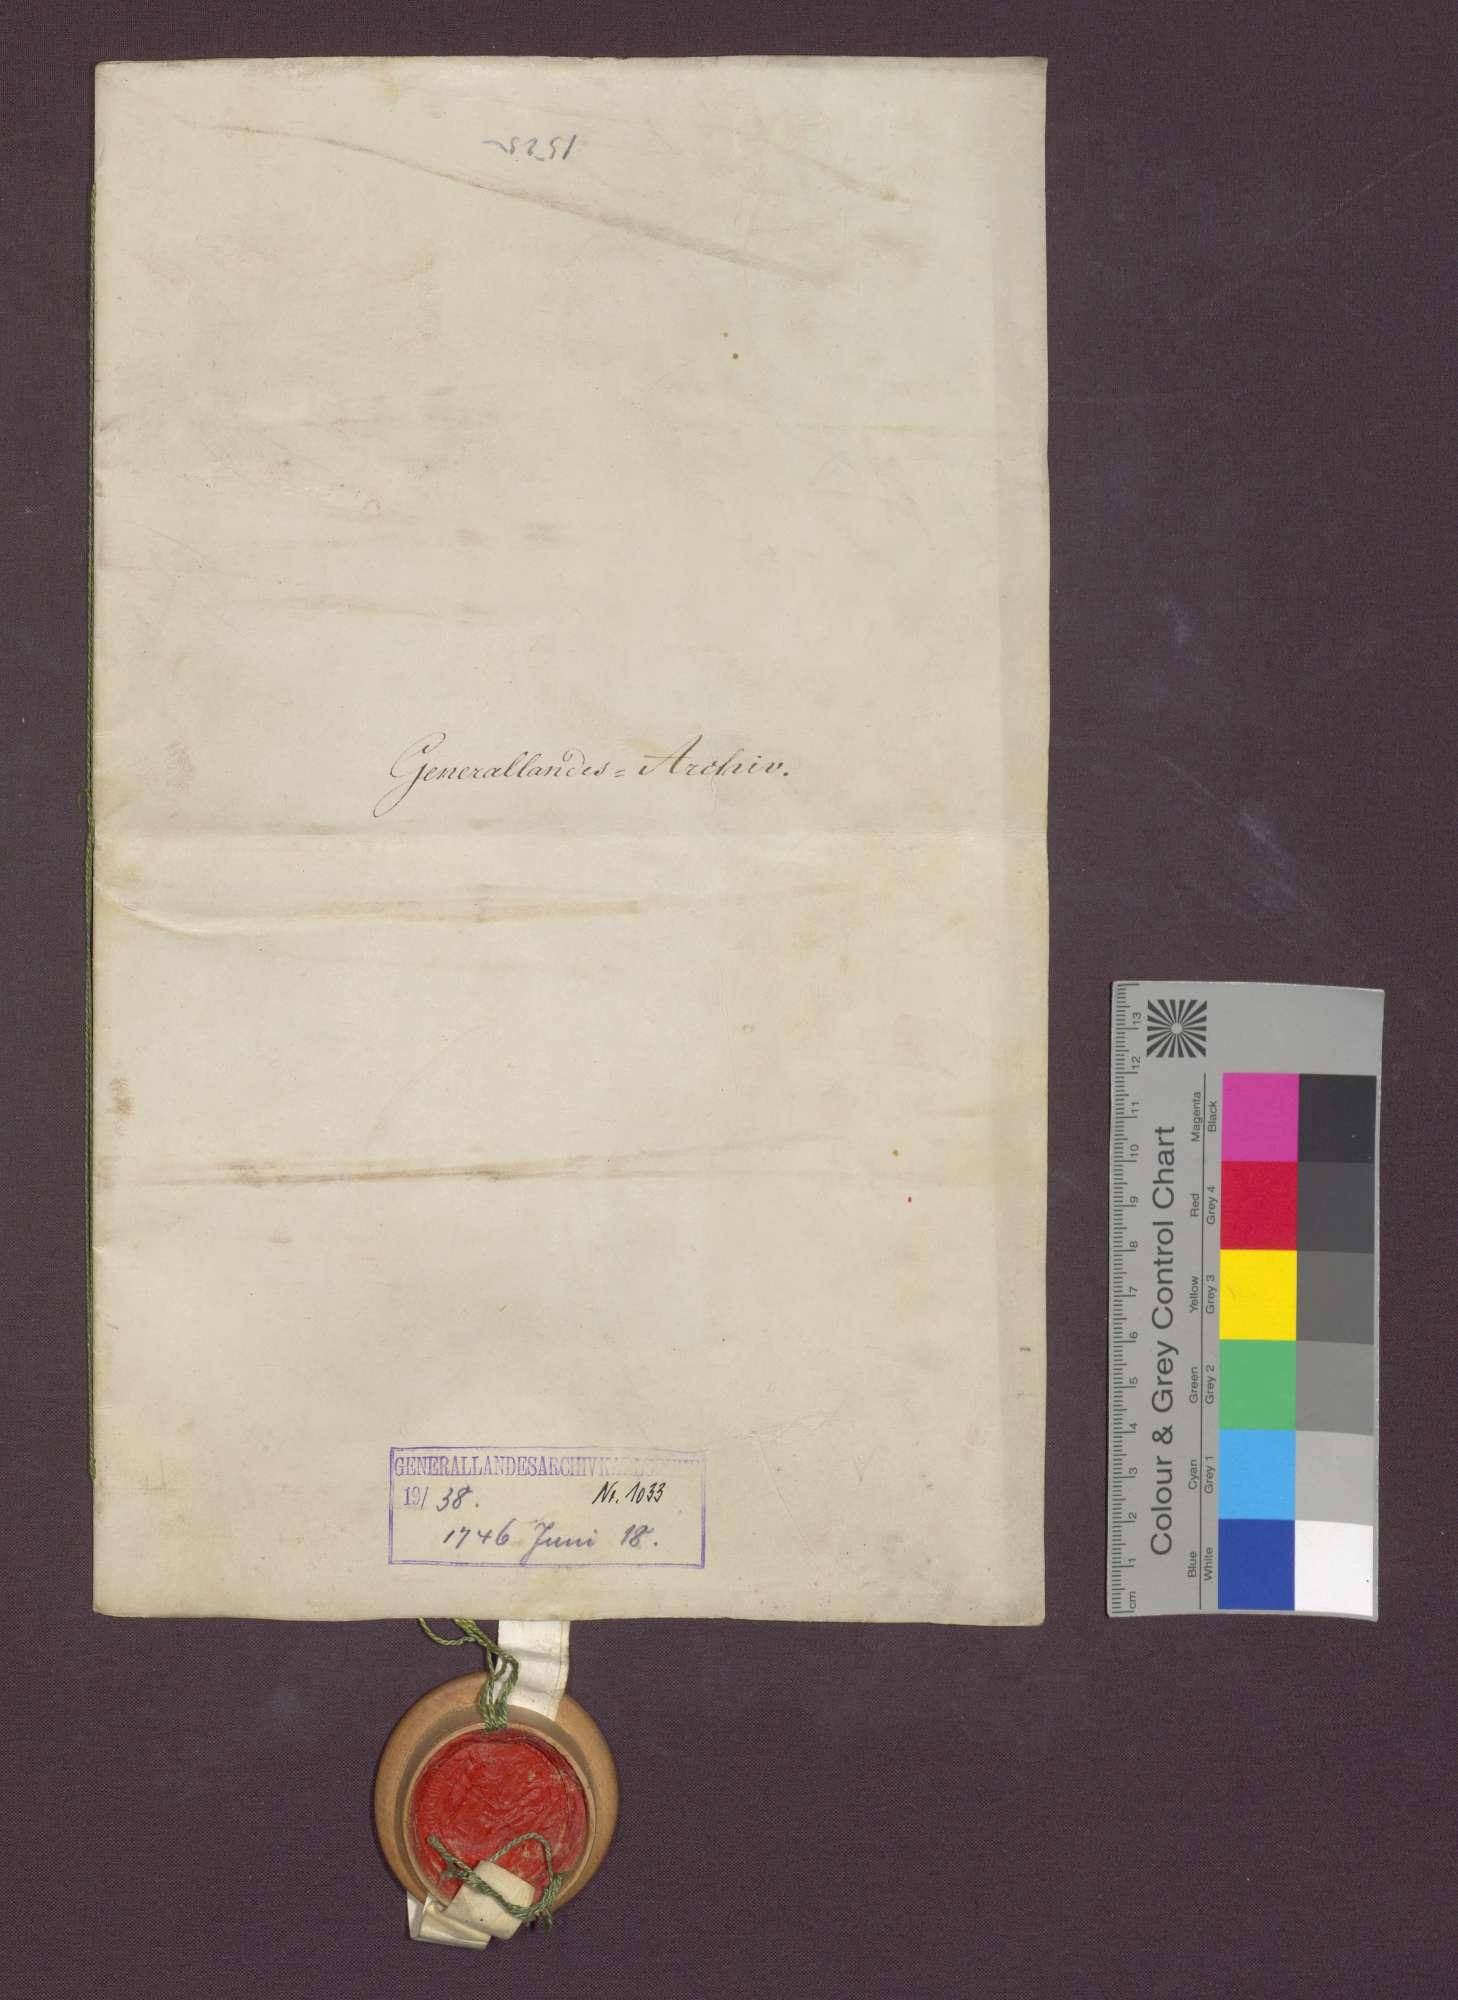 Lehnrevers des Johannes Zimmermann gegenüber dem Basler Domkapitel., Bild 1